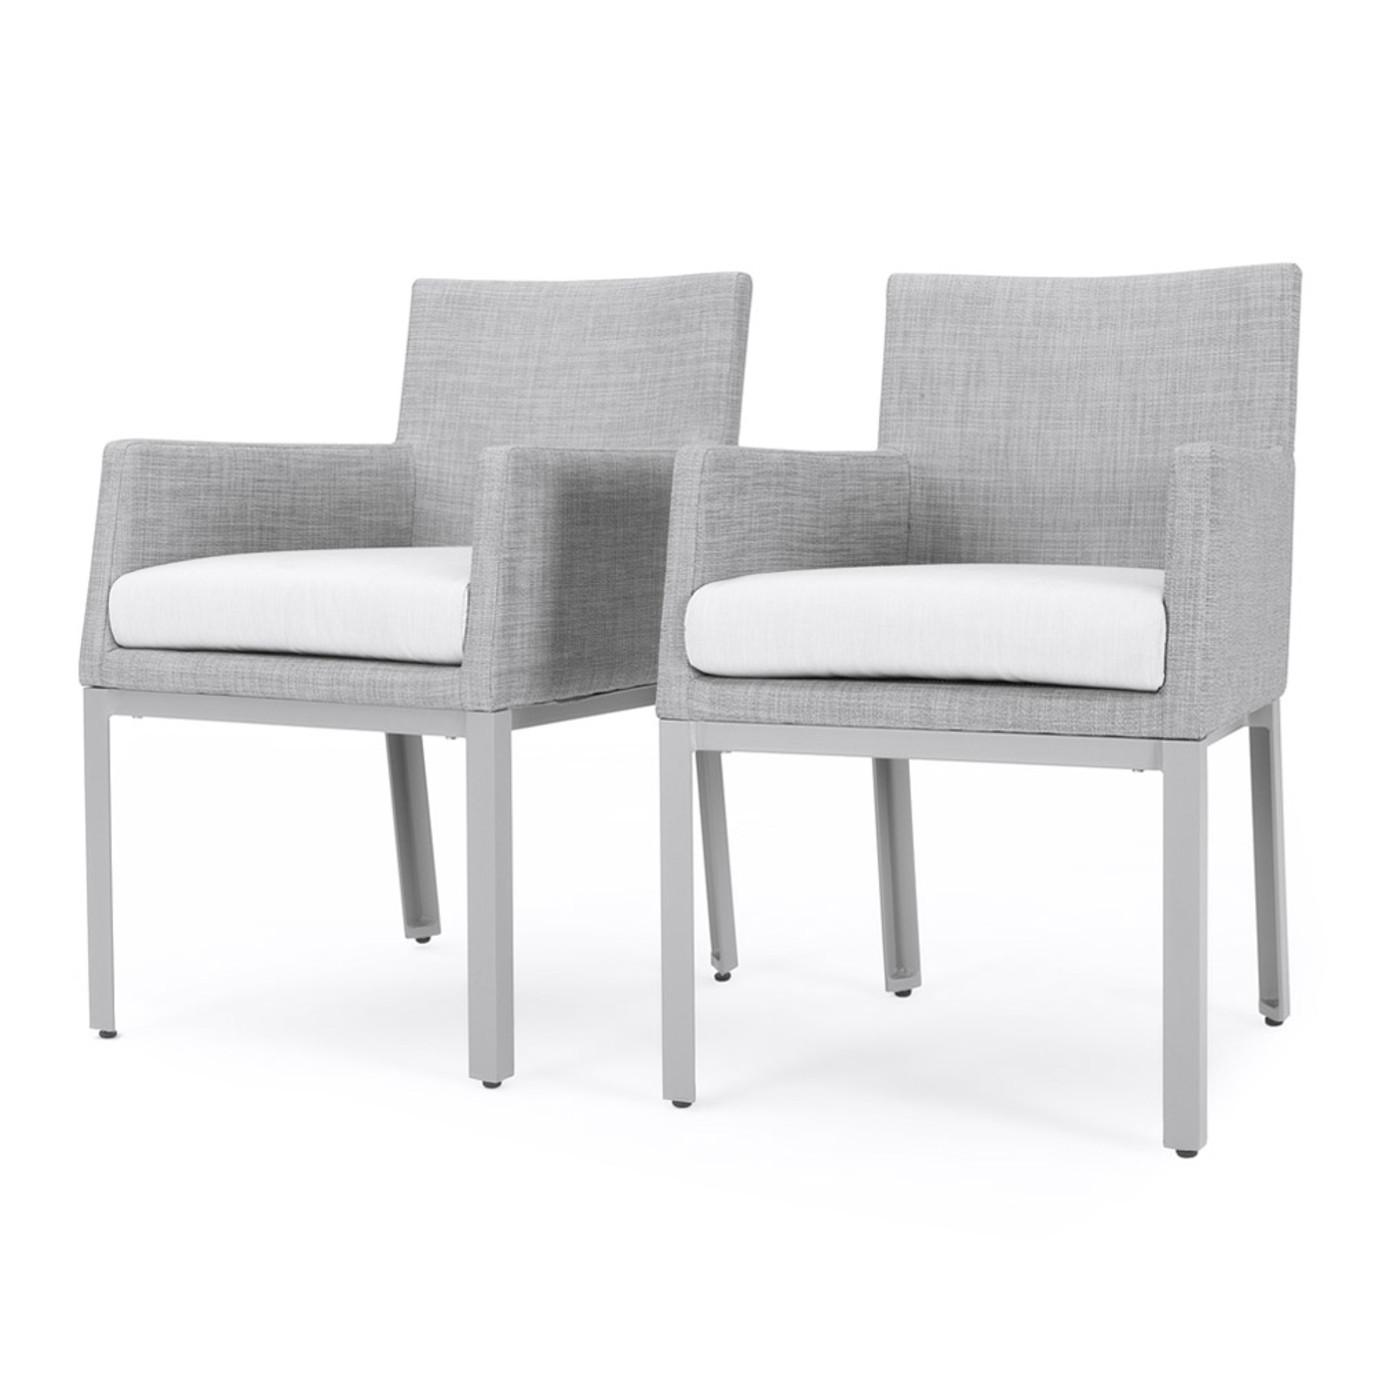 Portofino® Sling 2 Piece Dining Chairs